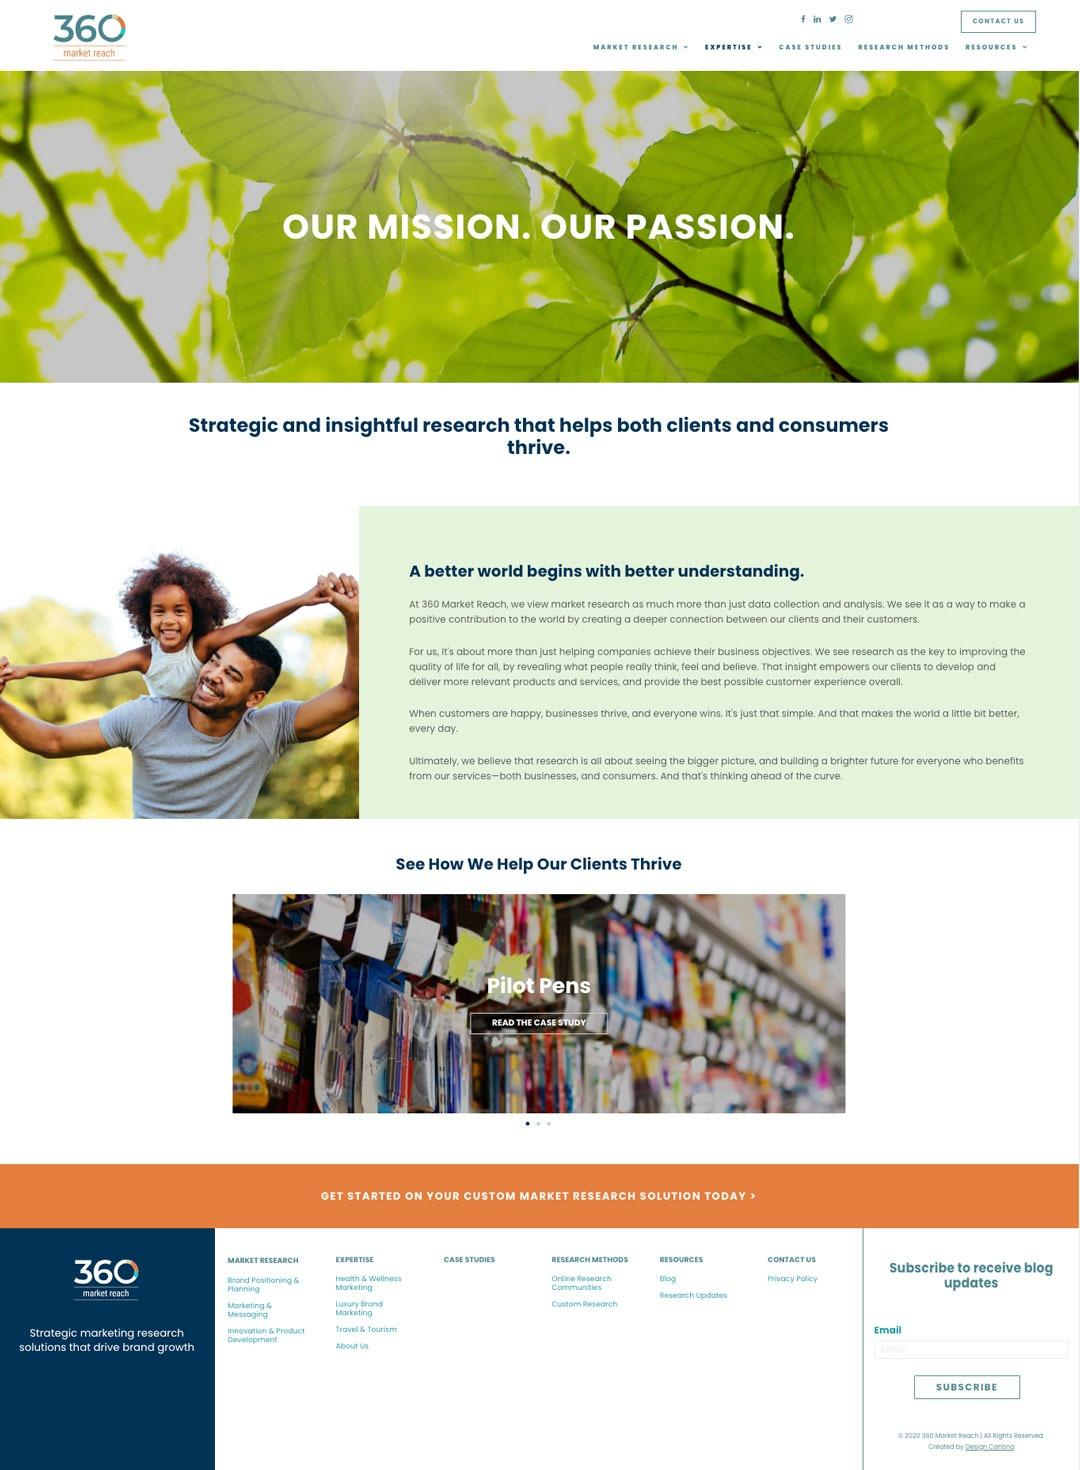 360-market-reach-website-about-us-